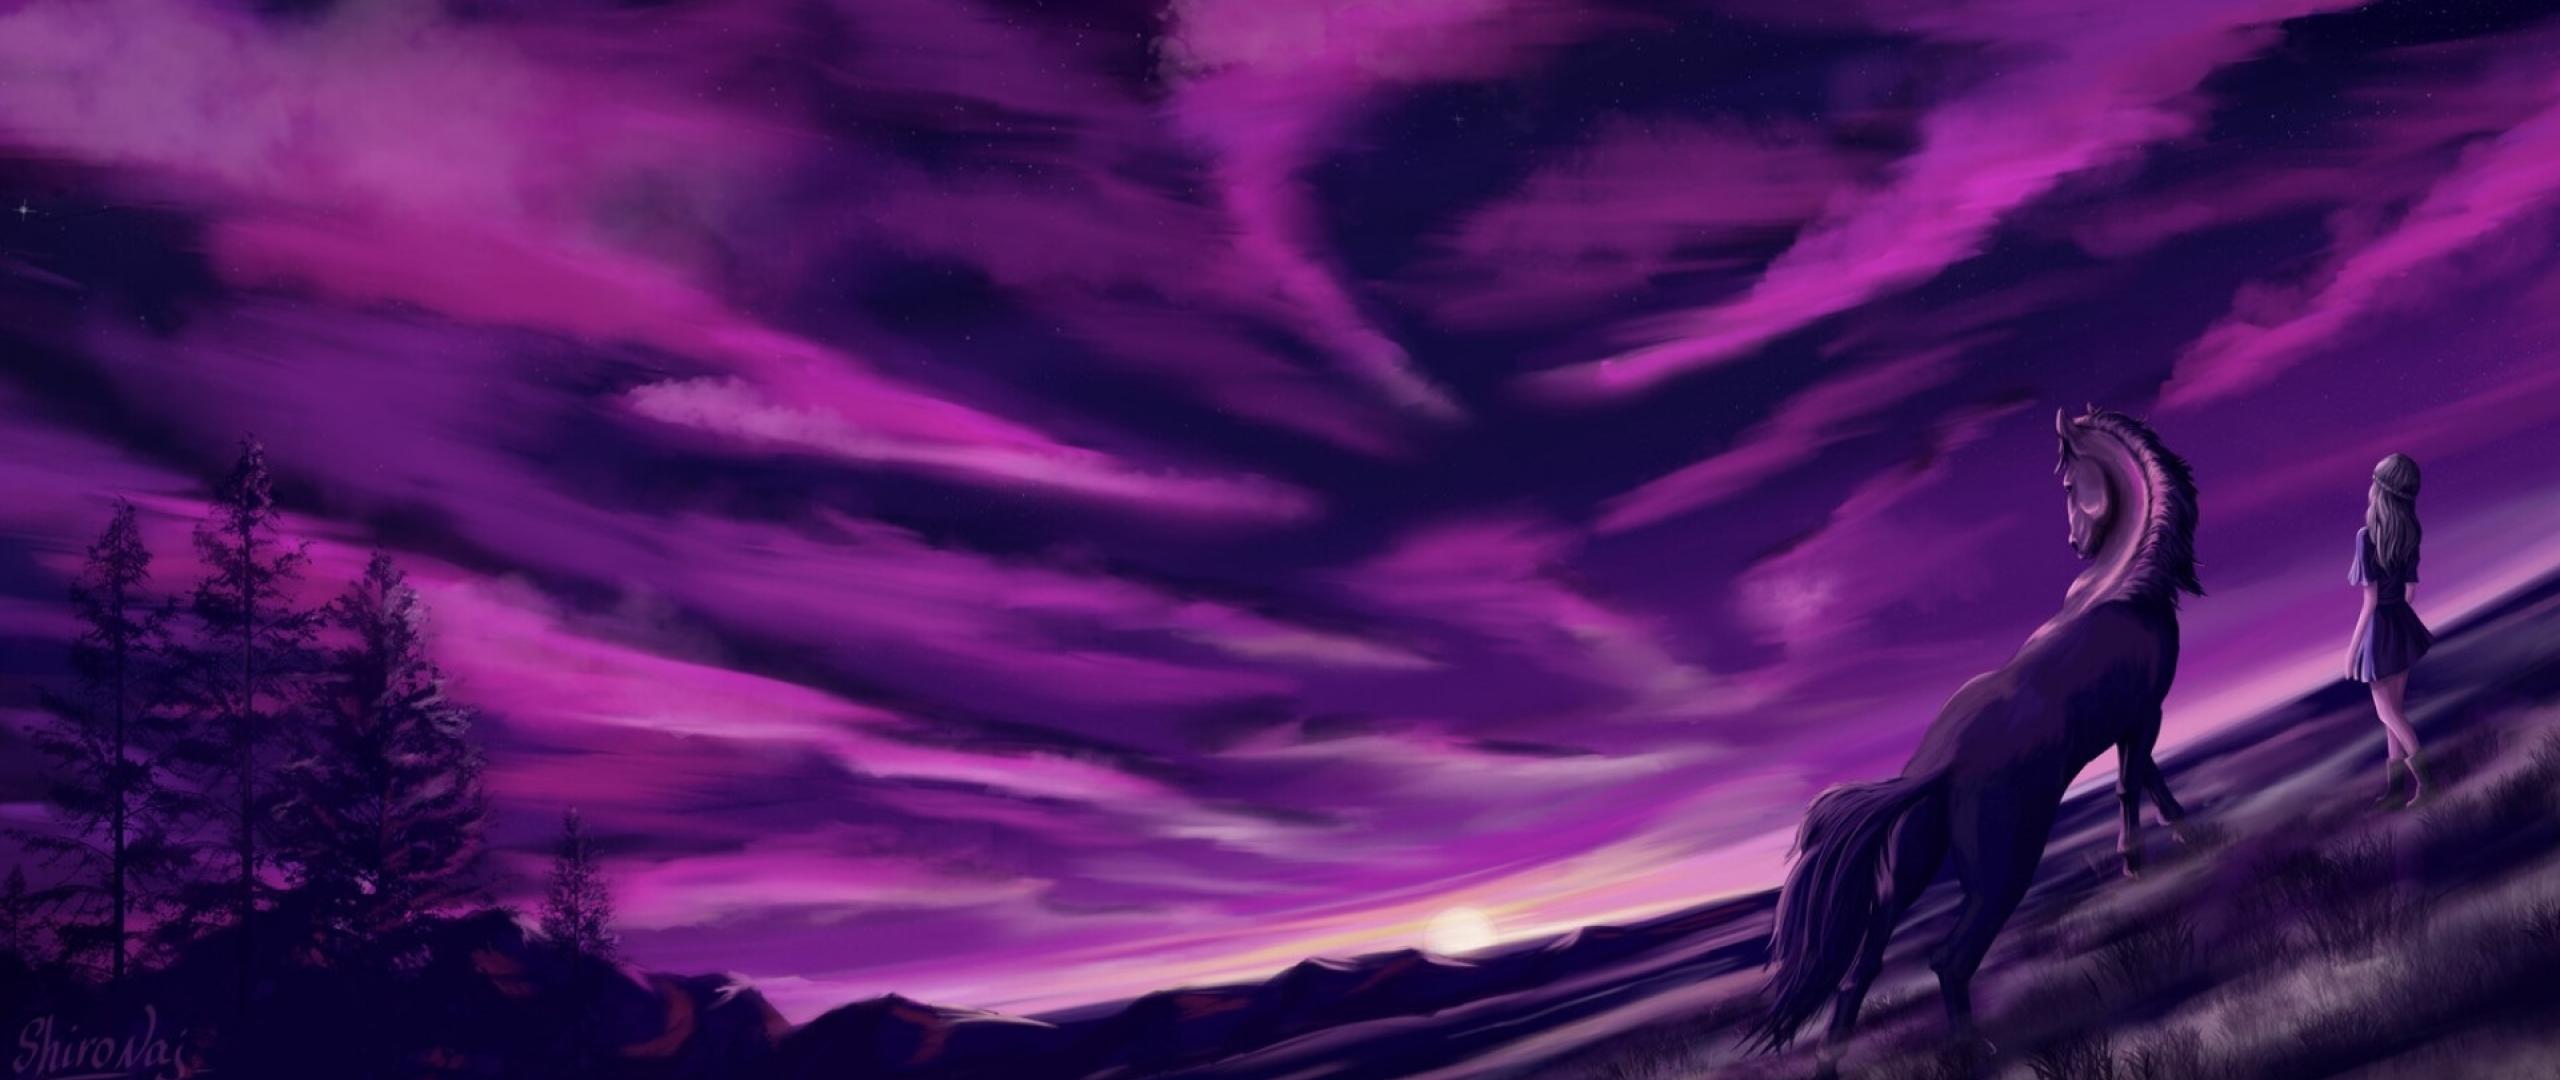 2560x1080 Purple Cool Sunrise 2560x1080 Resolution ...